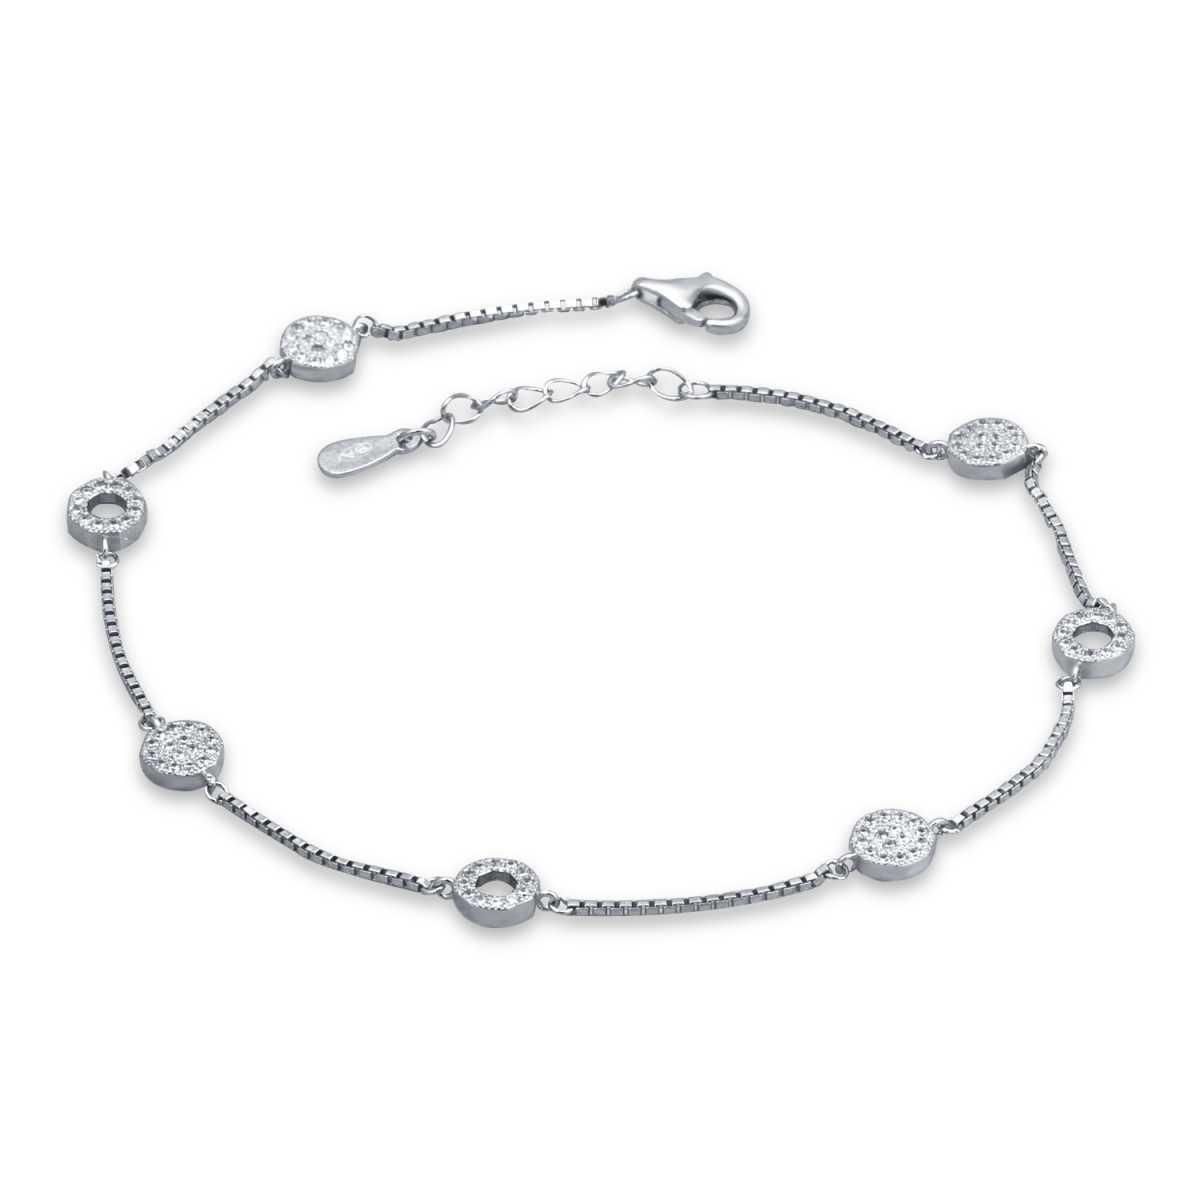 Charismatic Octagen Pave Diamond Anklet